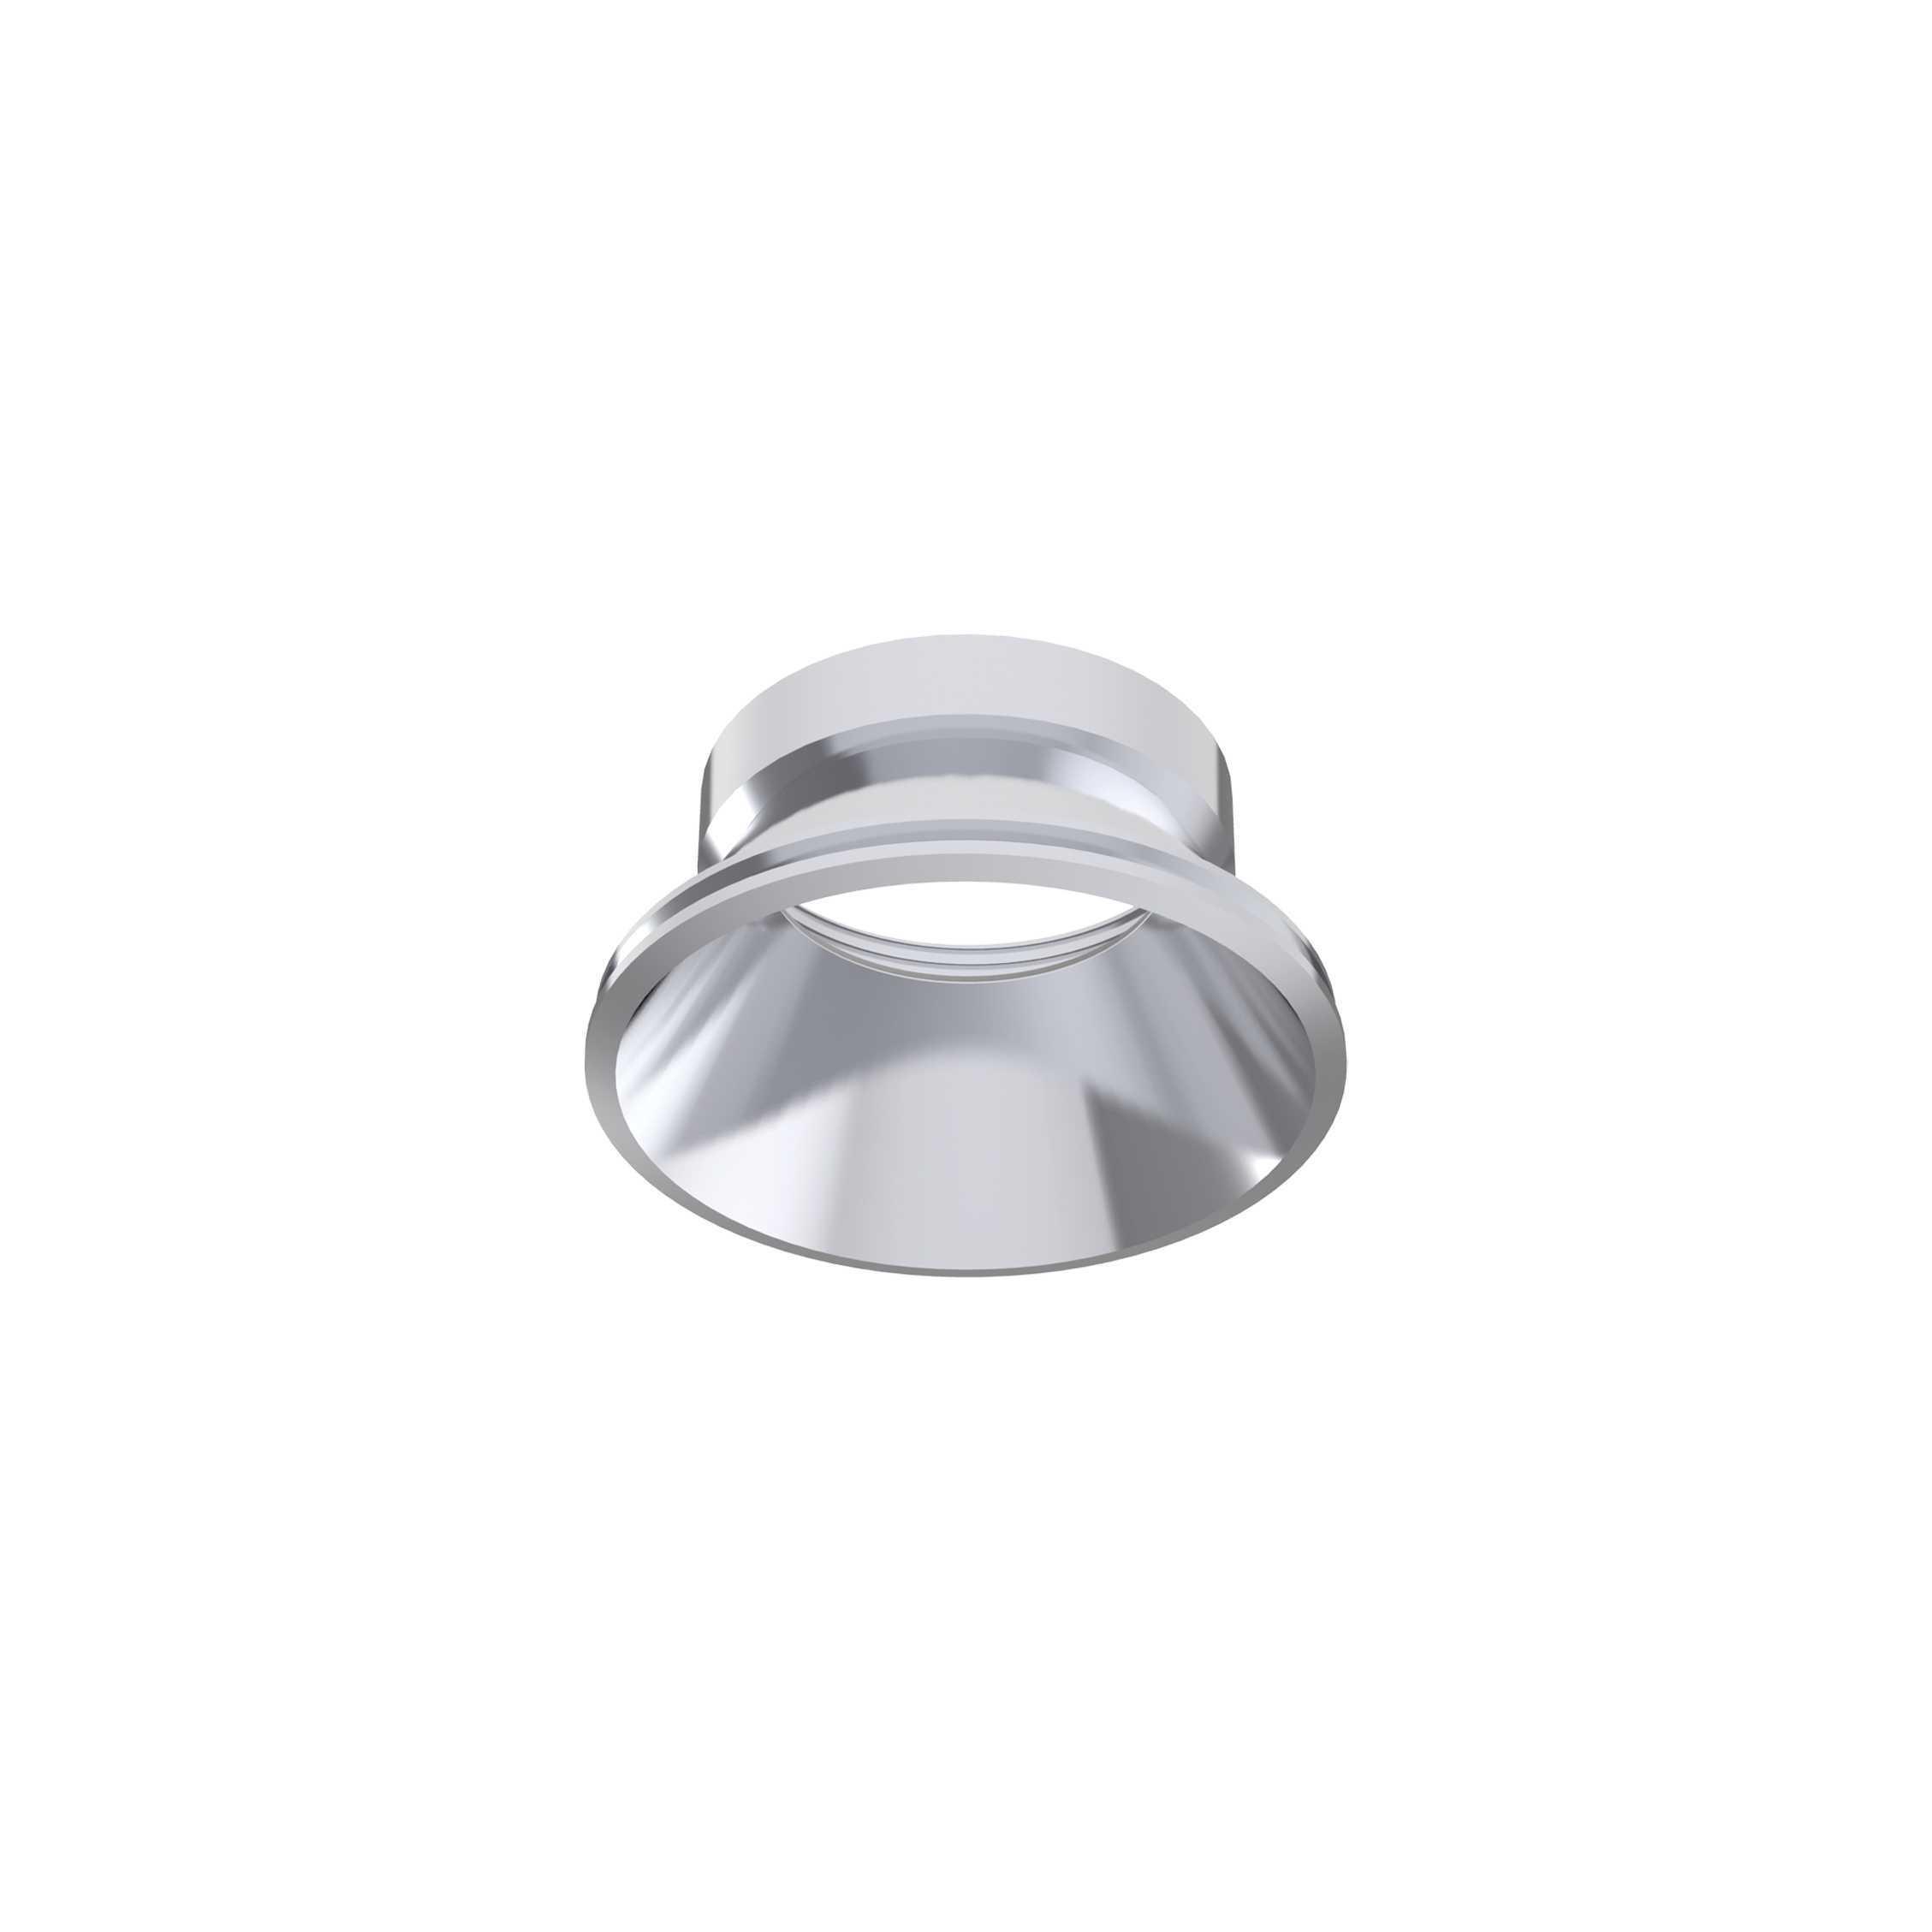 Рефлектор Ideal Lux DYNAMIC REFLECTOR ROUND FIXED CHROME 221649, хром, металл - фото 1